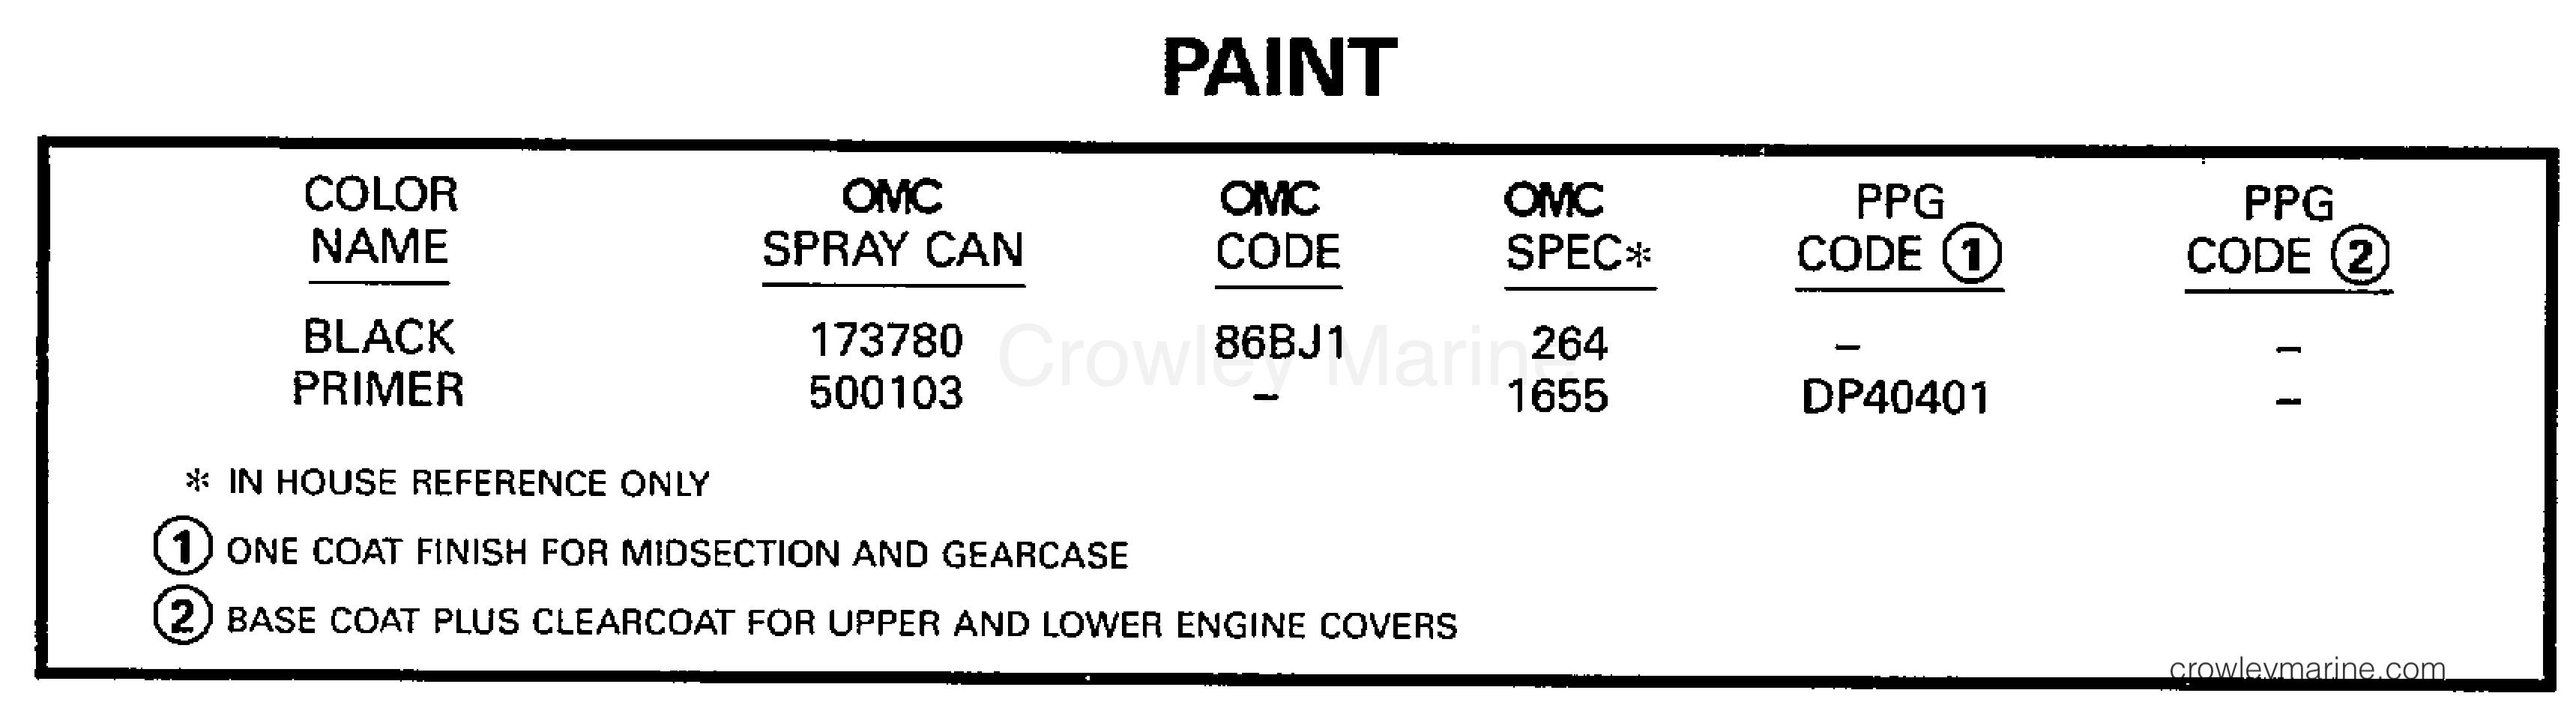 1997 Electric Motors 24 Volt - BFX4TPV - PAINT